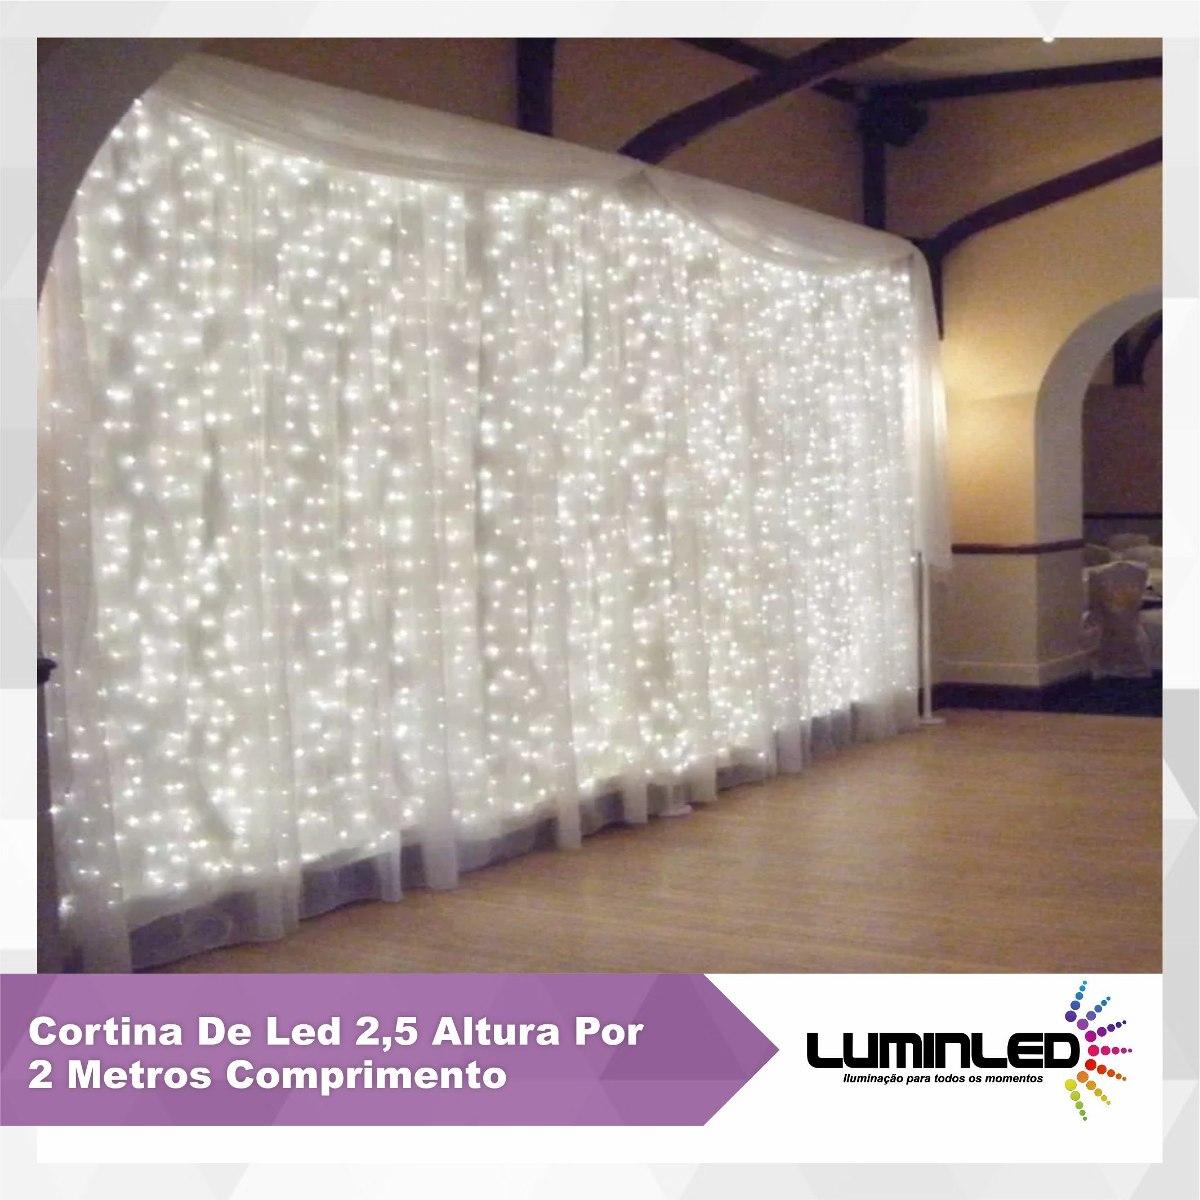 Cortina de led 2 5 altura por 2 5 metros comprimento r - Cortinas por metros ...